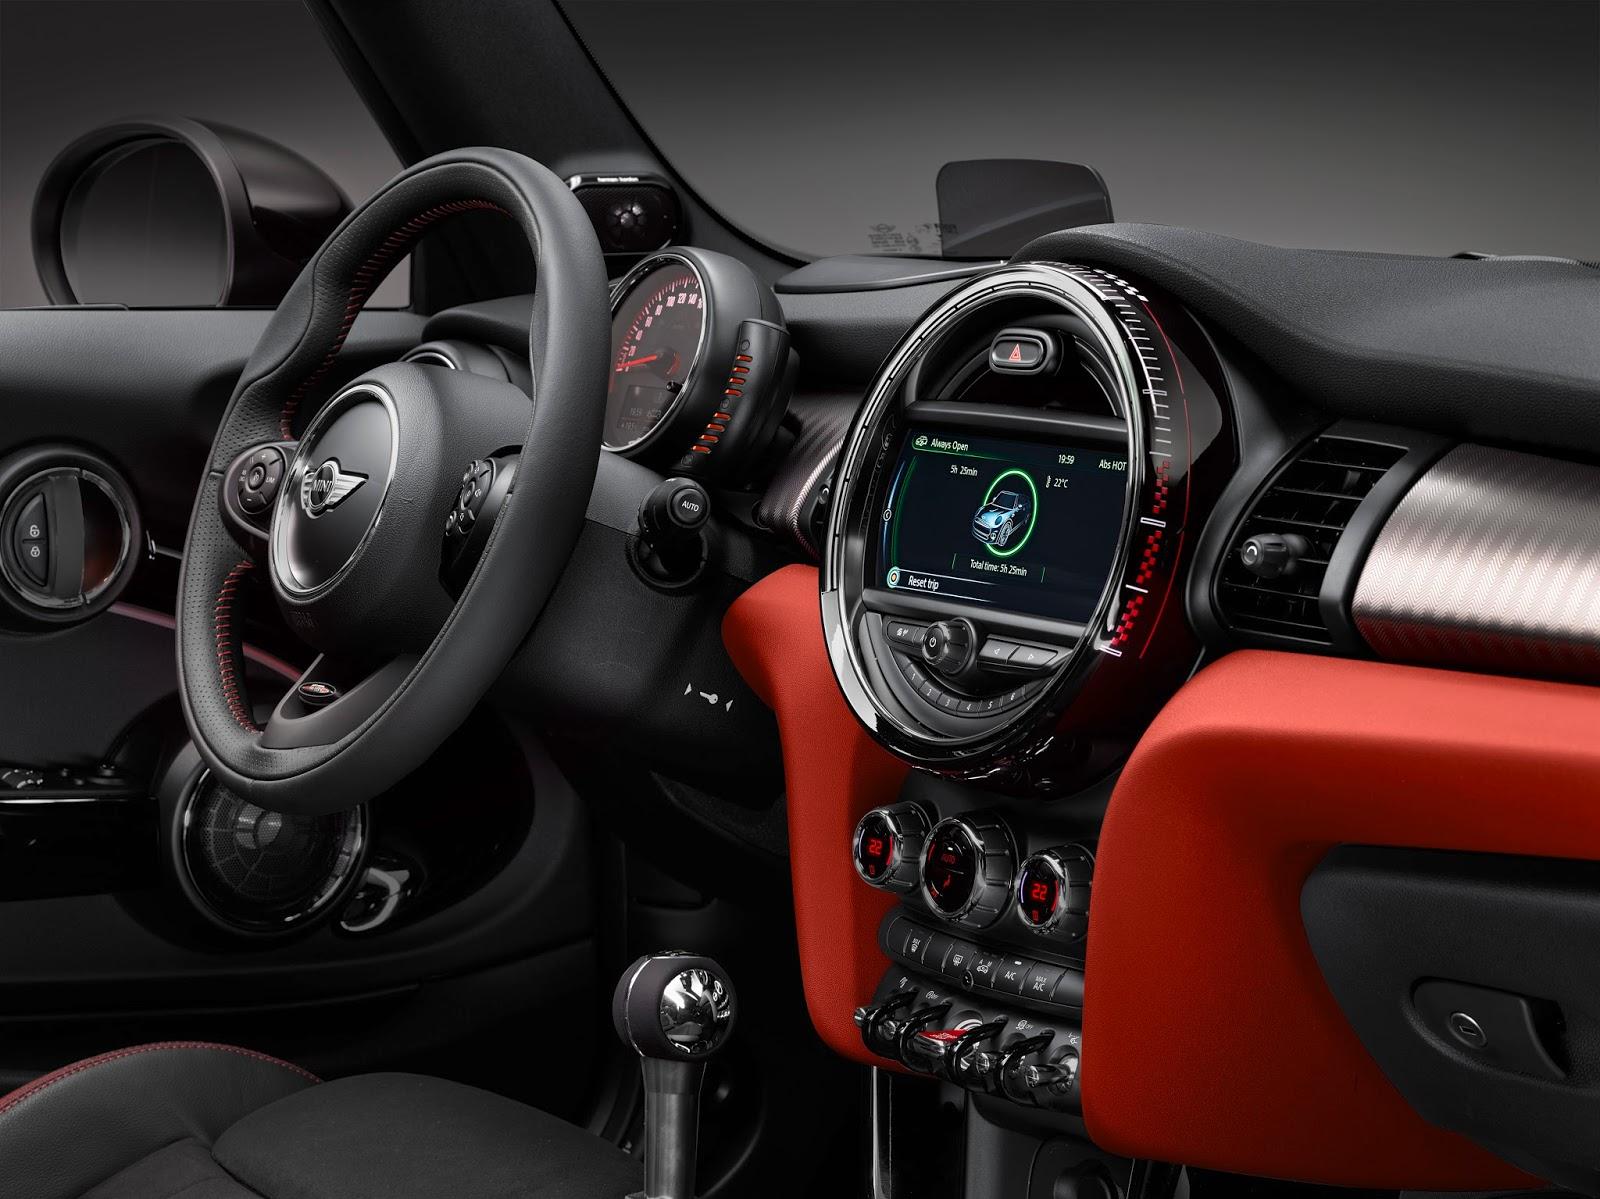 P90206793 highRes Έρχεται το νέο MINI John Cooper Works Cabrio με 231 ίππους